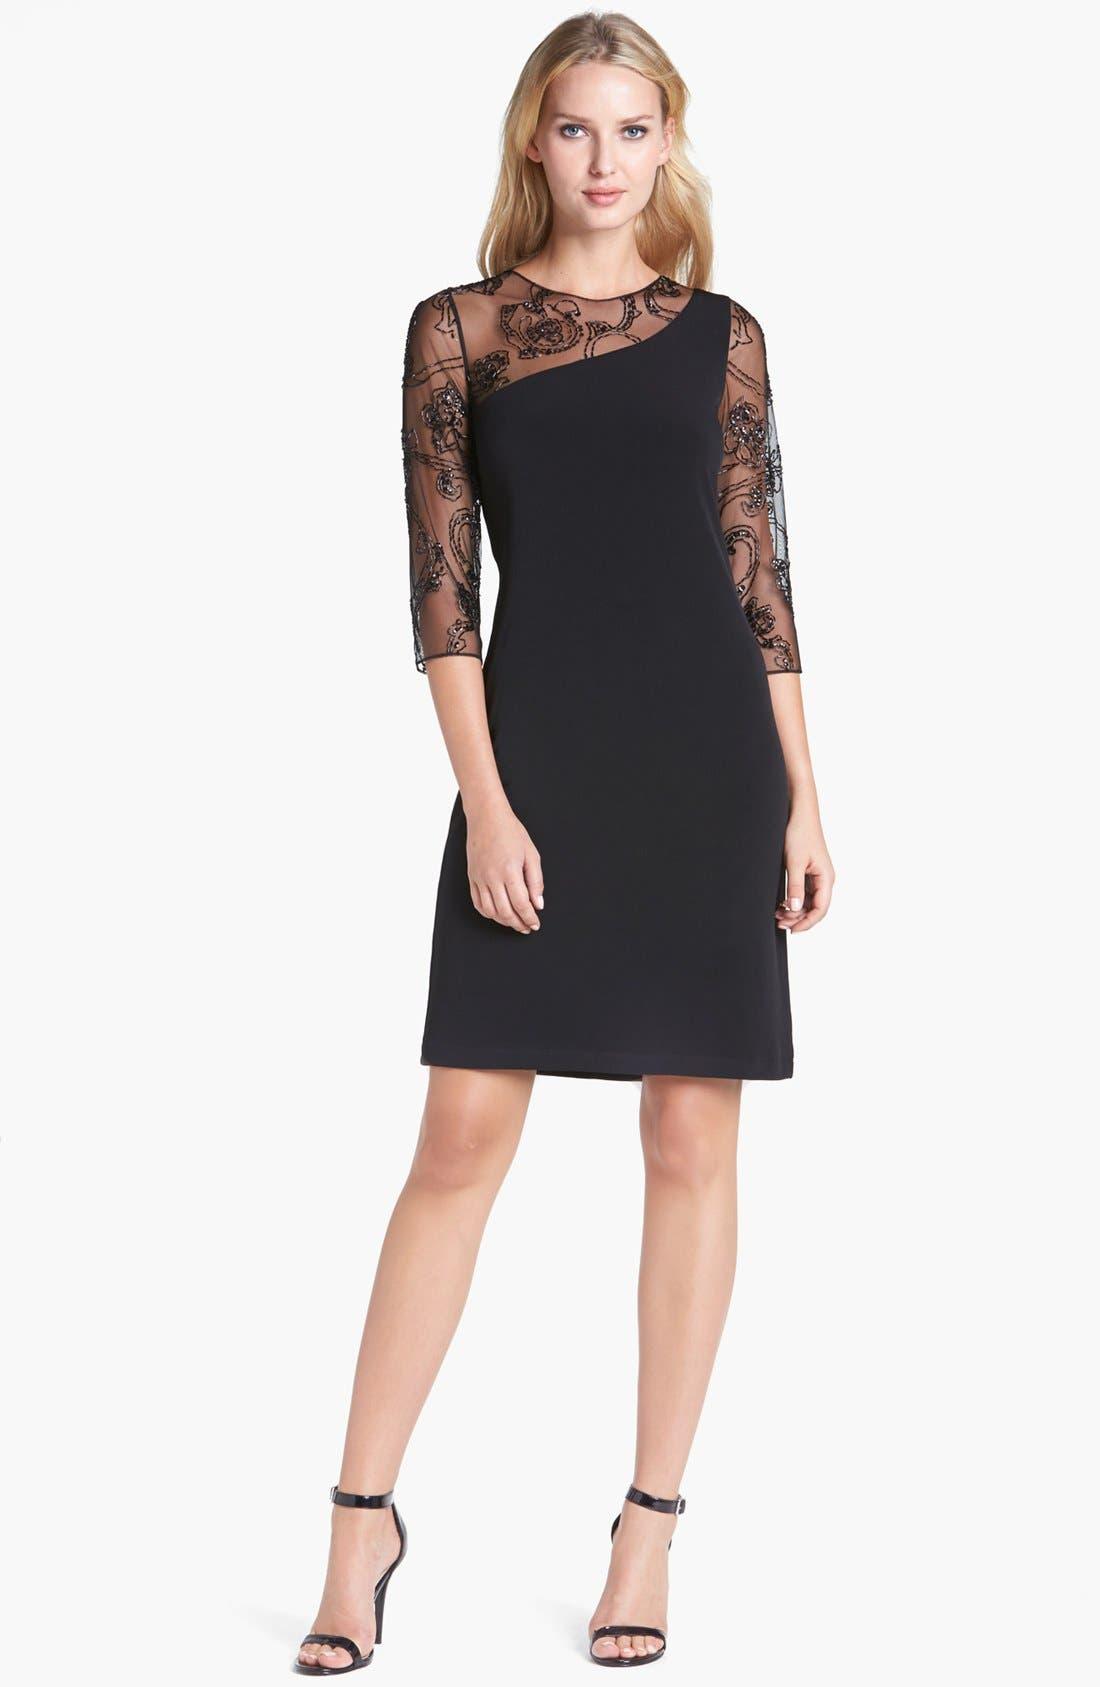 Alternate Image 1 Selected - Patra Illusion Yoke Jersey Dress